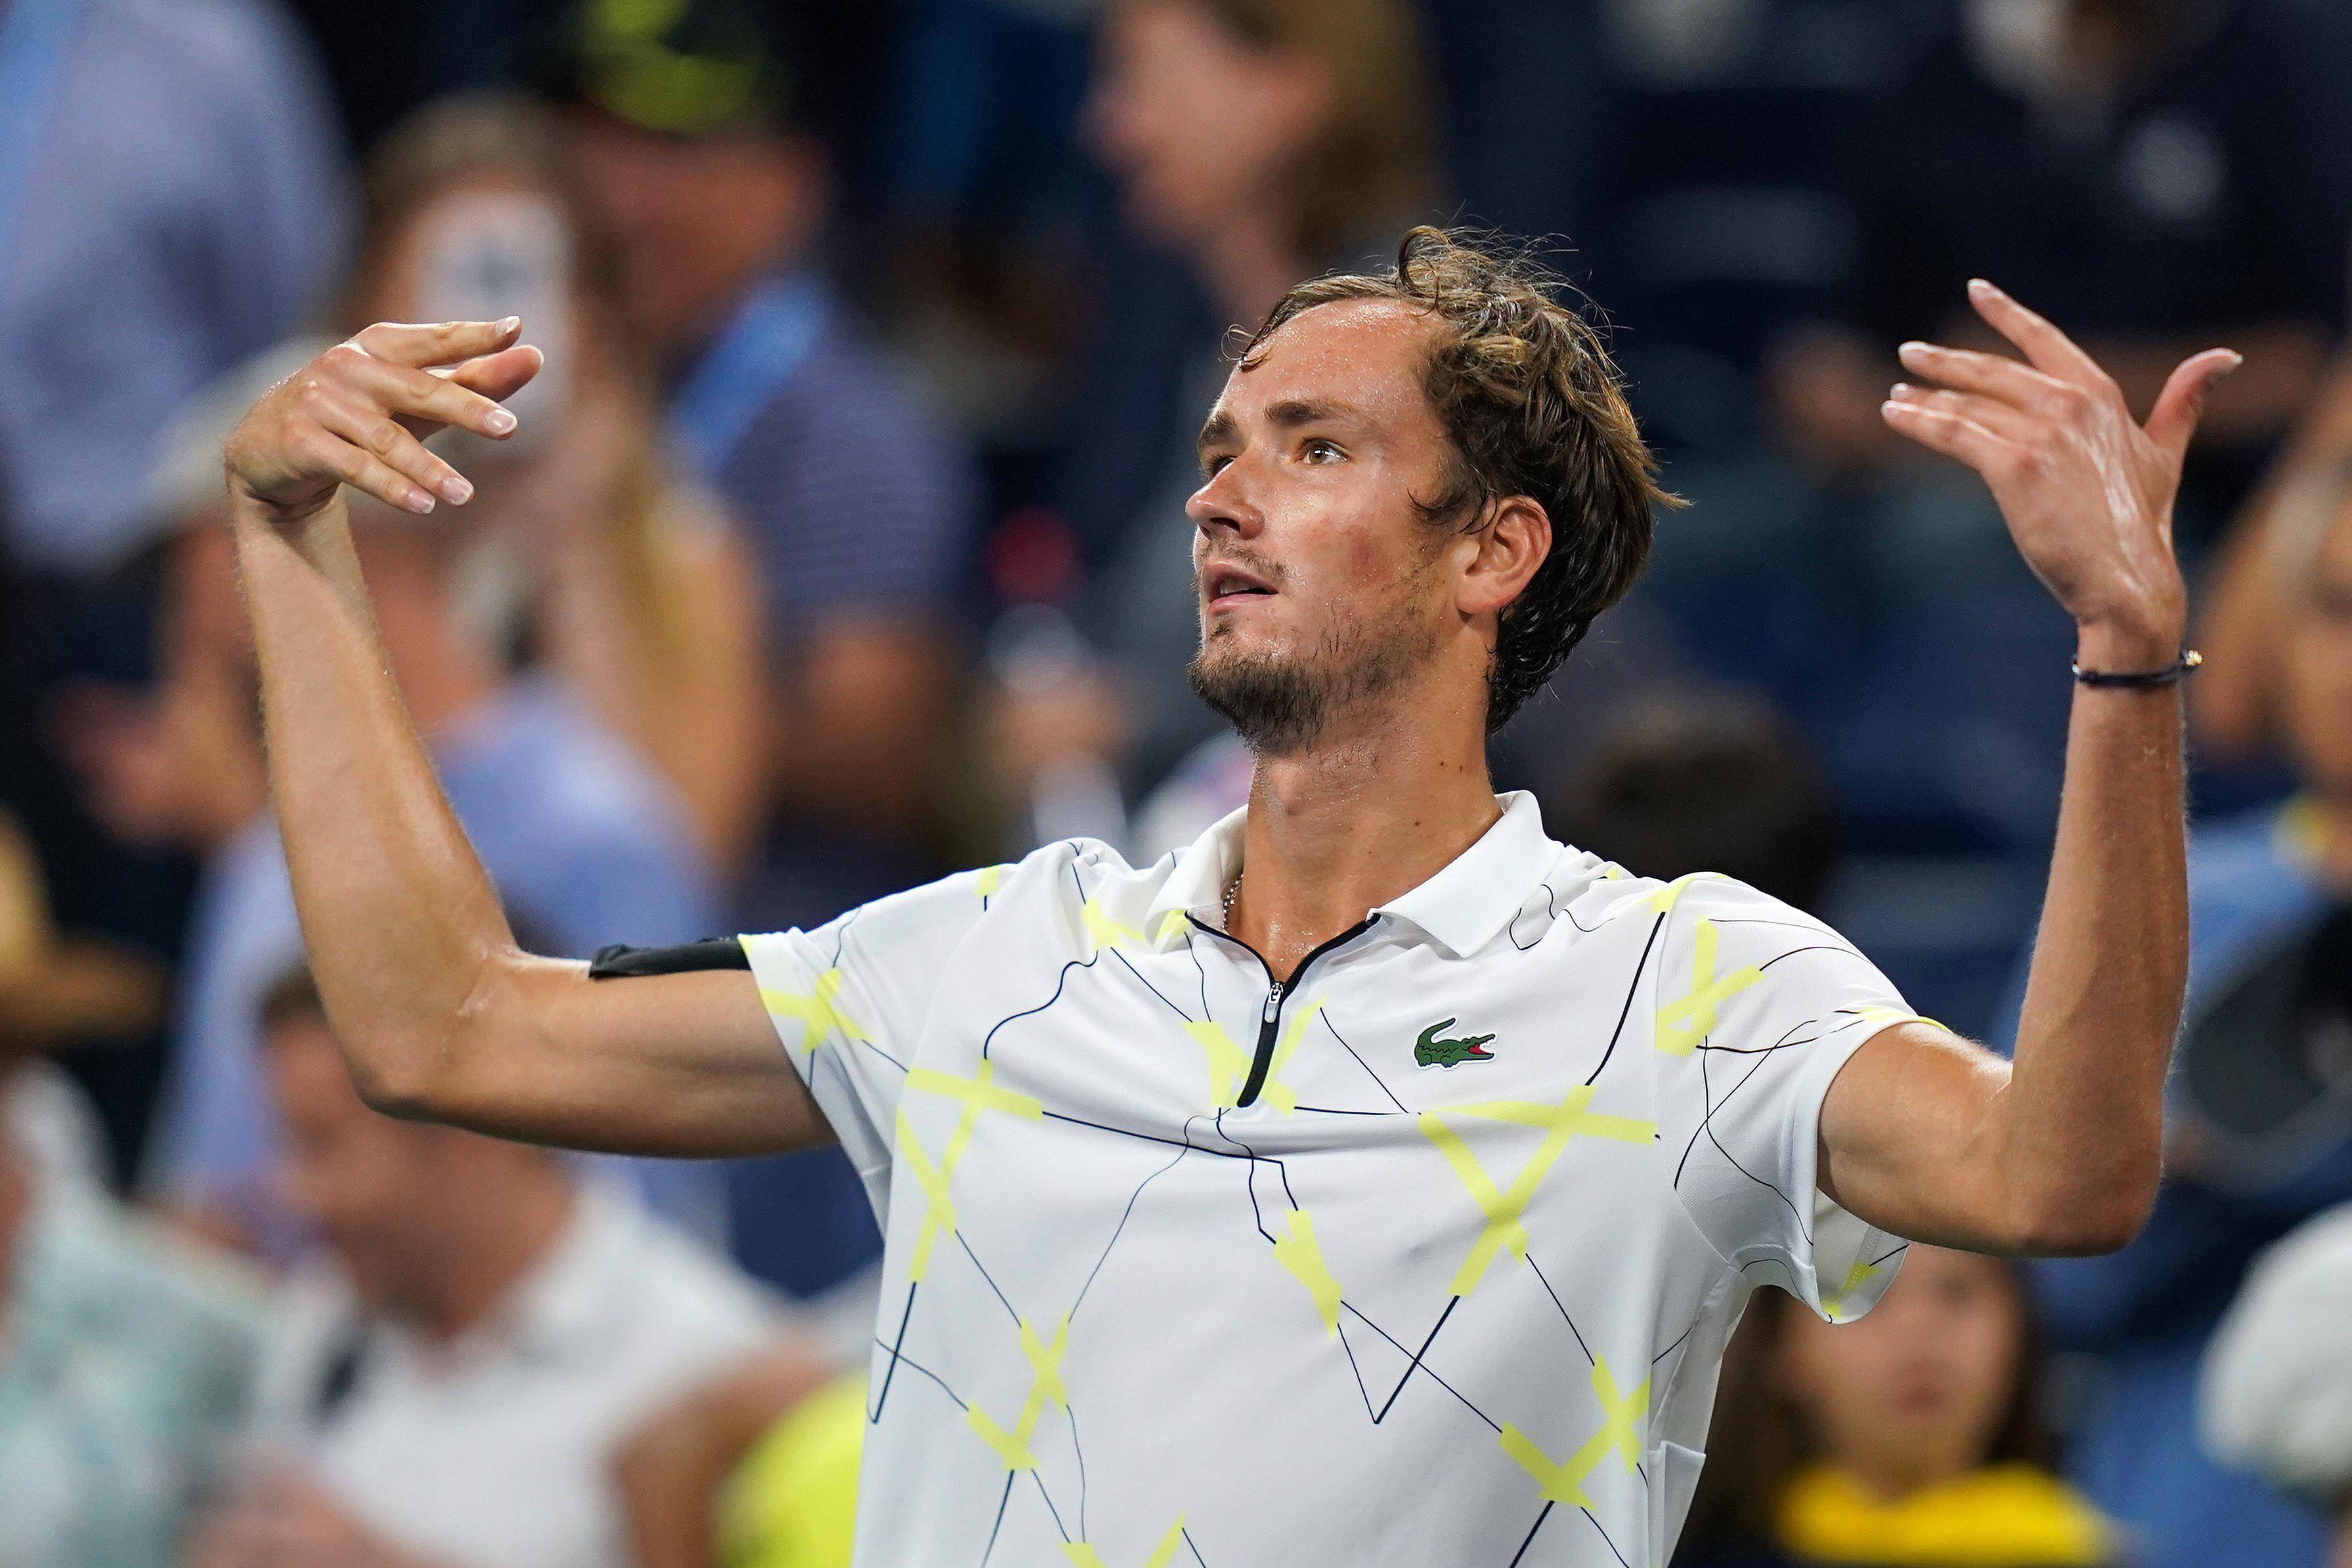 Daniil Medvedev Is the Next Great Tennis Villain - InsideHook